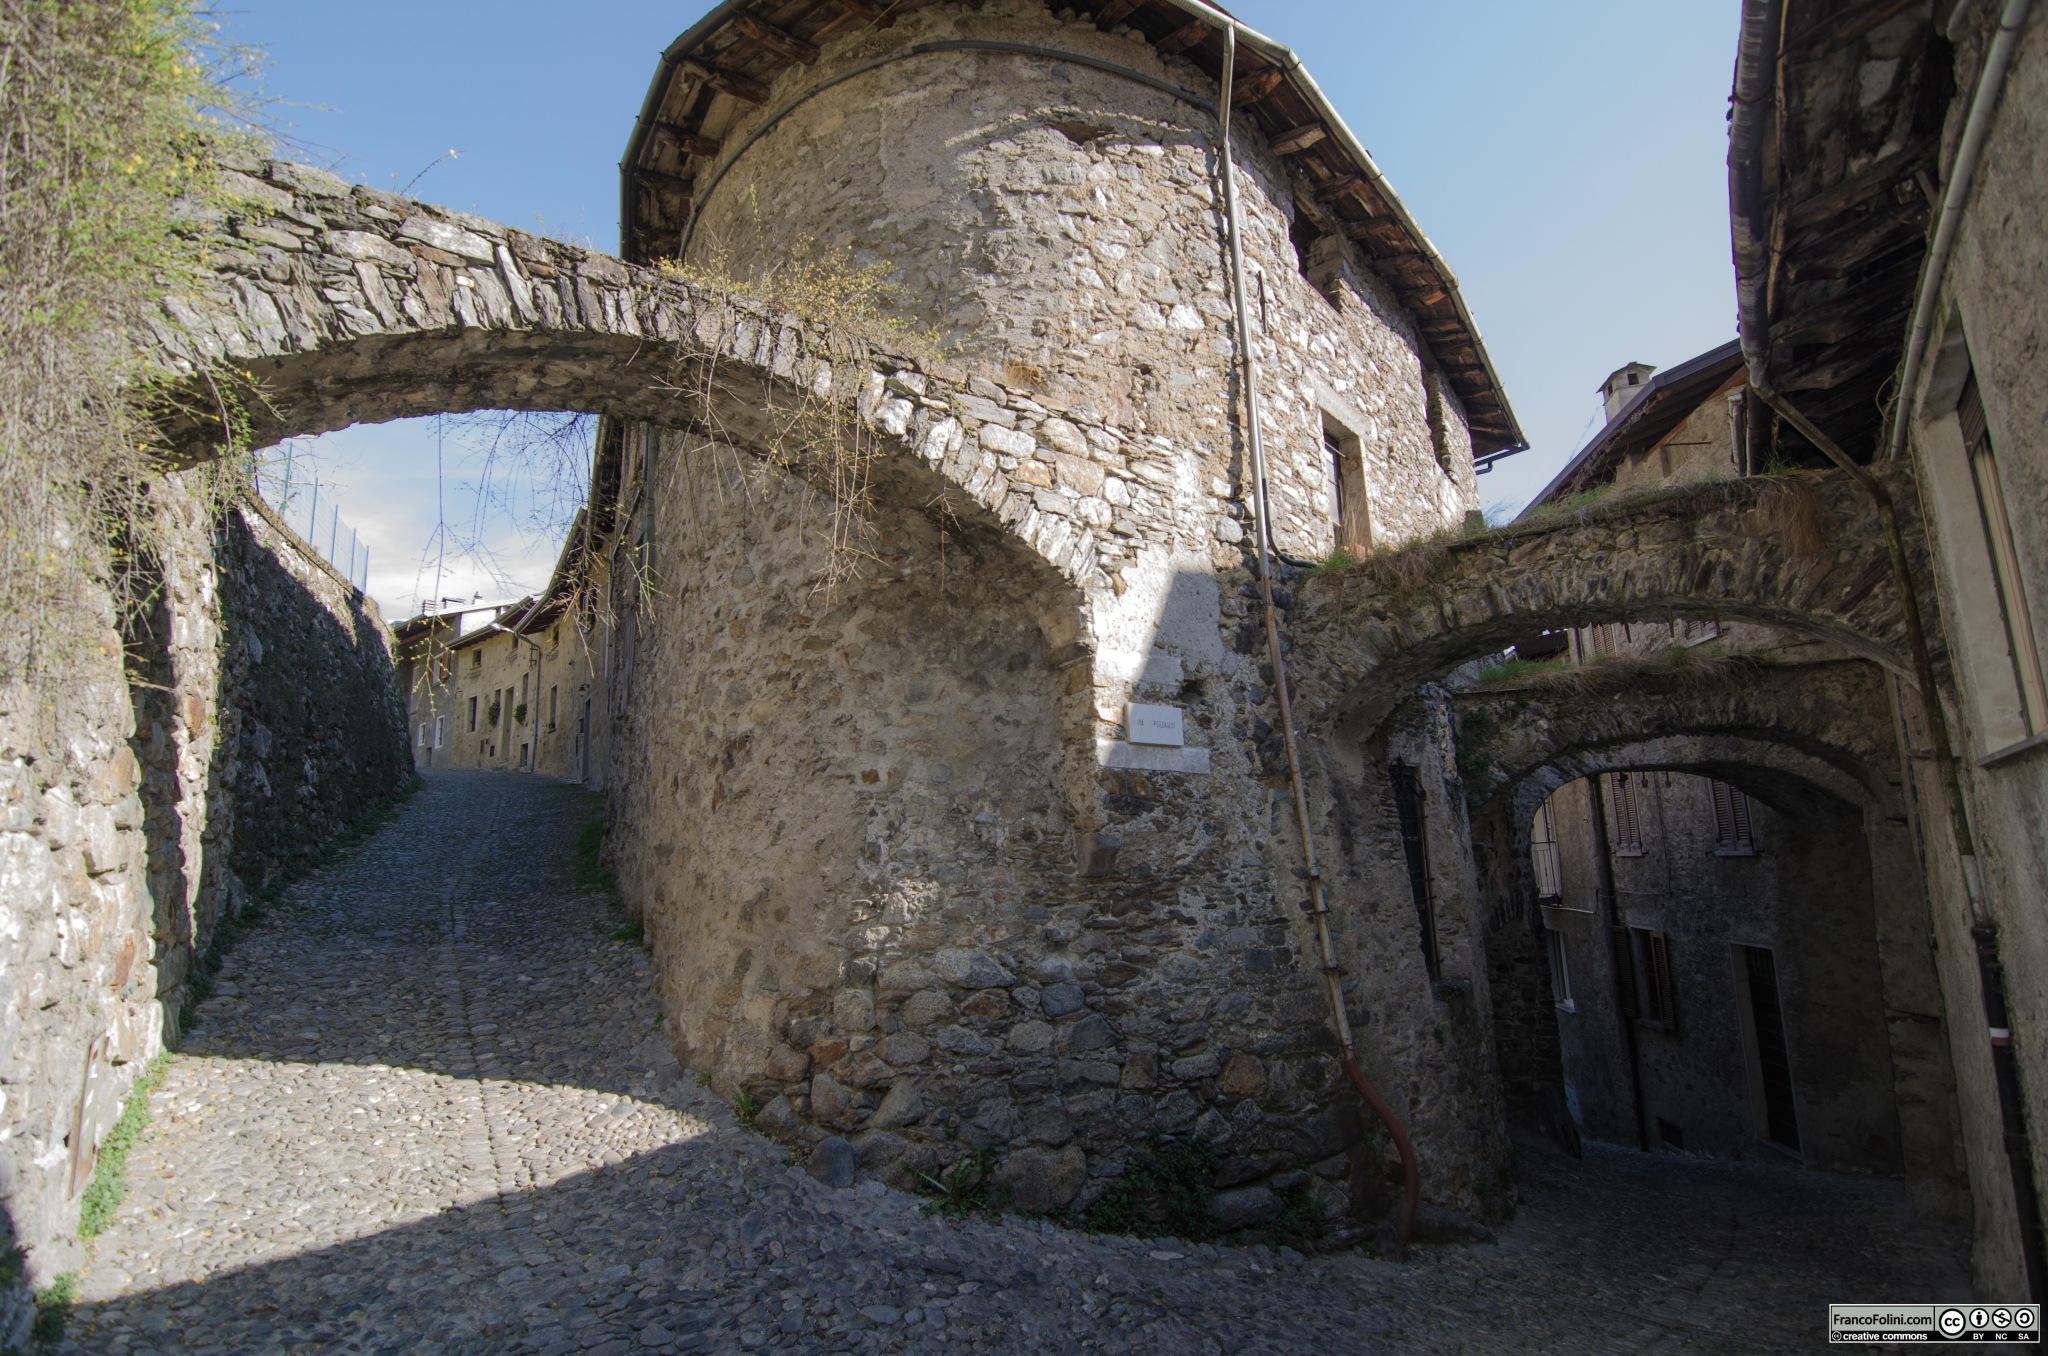 Via Paradiso e via Pozzalio, Ponte in Valtellina, SO Italy